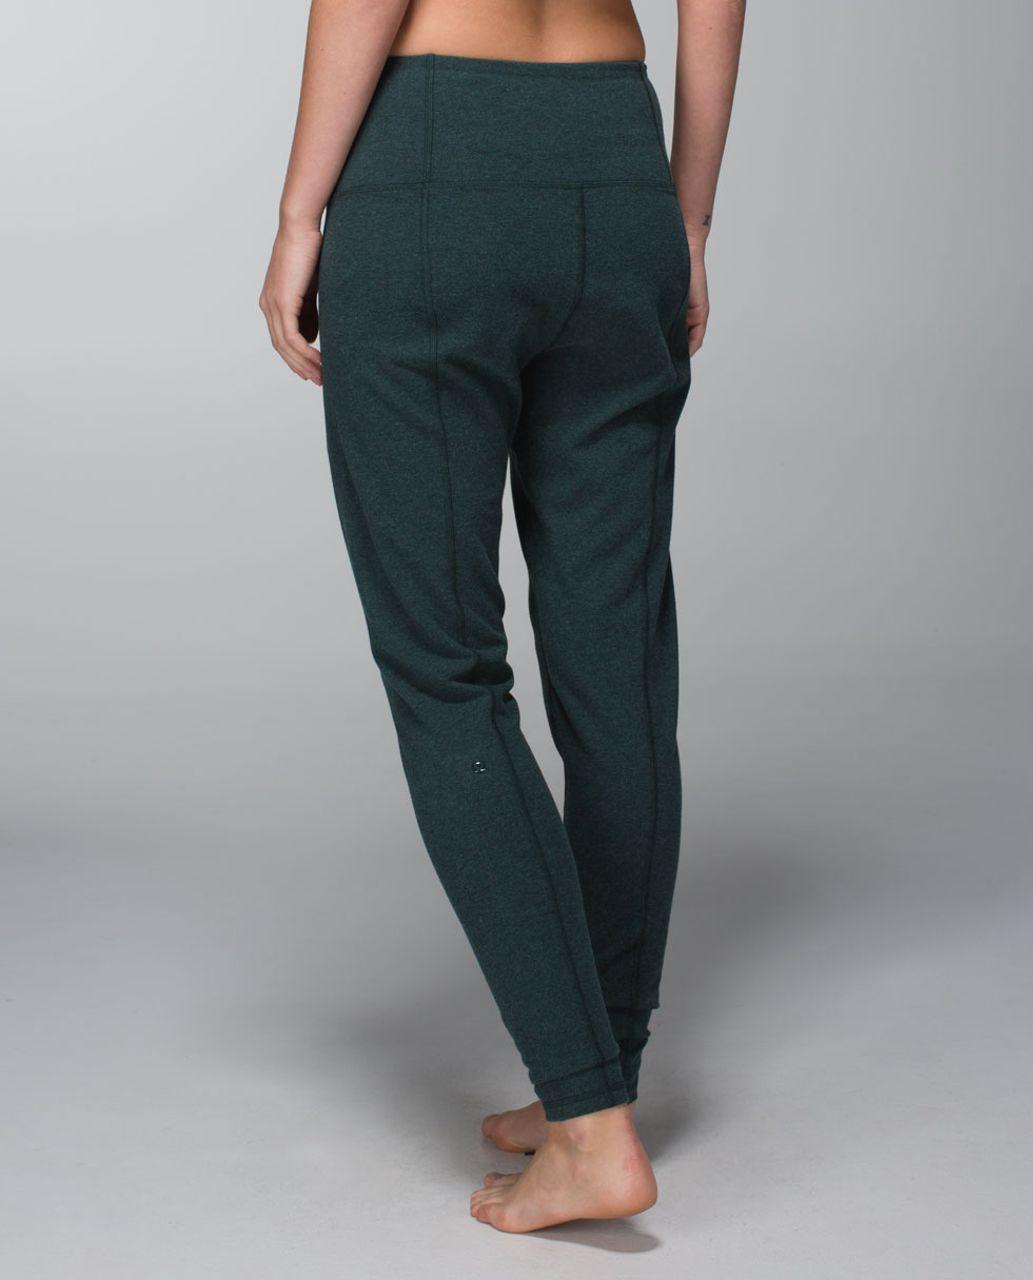 Lululemon Atman Pant - Heathered Fuel Green